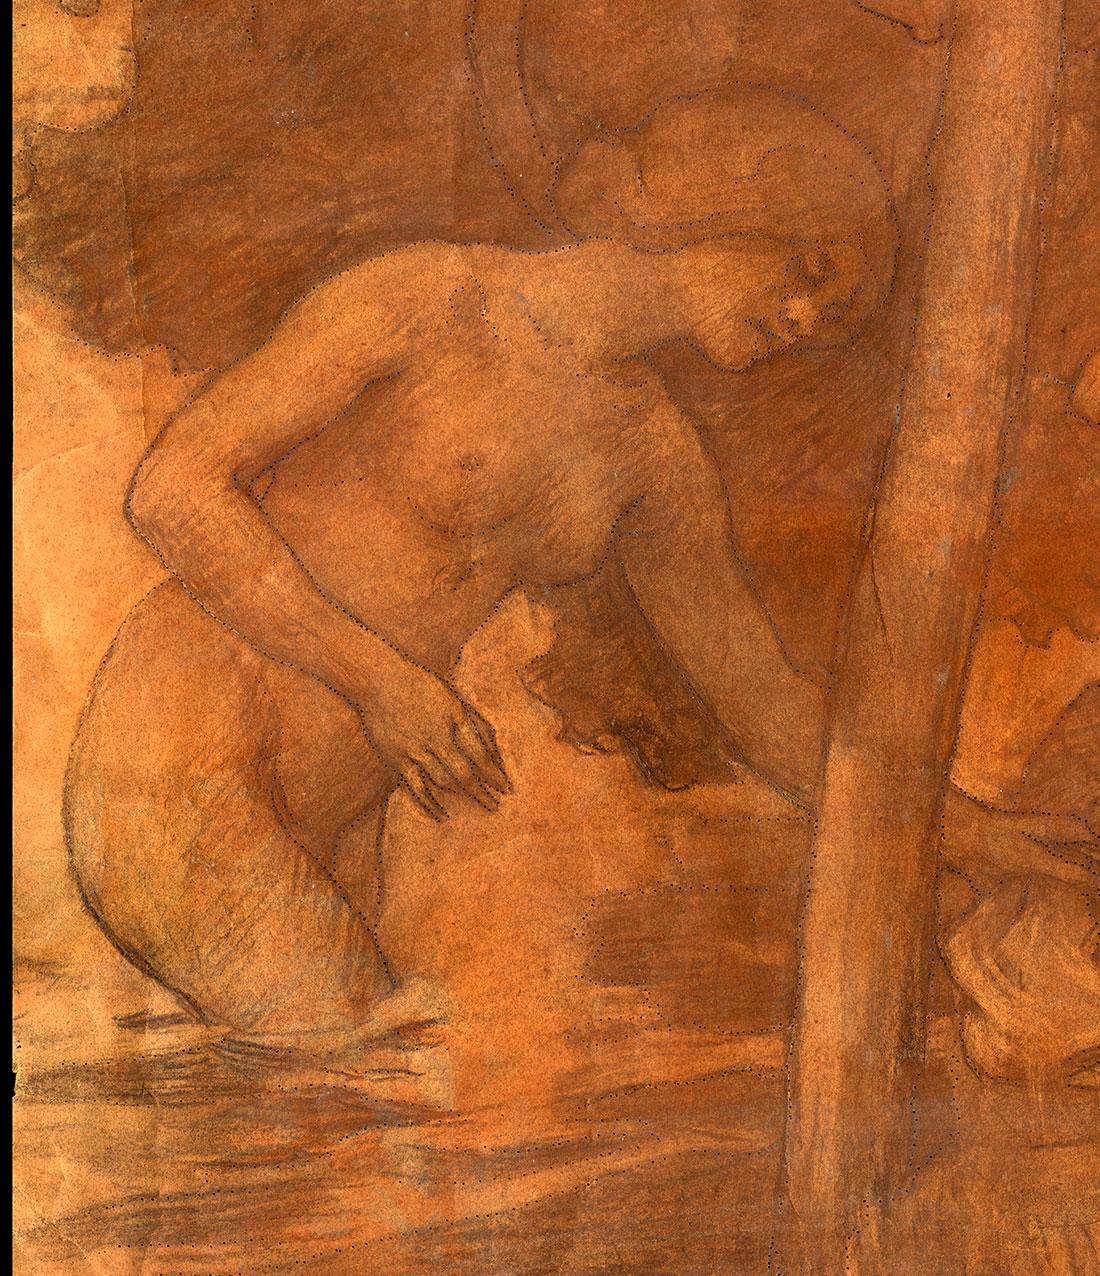 Henri Lerolle Attelage Paysanne Basque Symboliste Chabas Seon Nabis Degas Manet Morisot